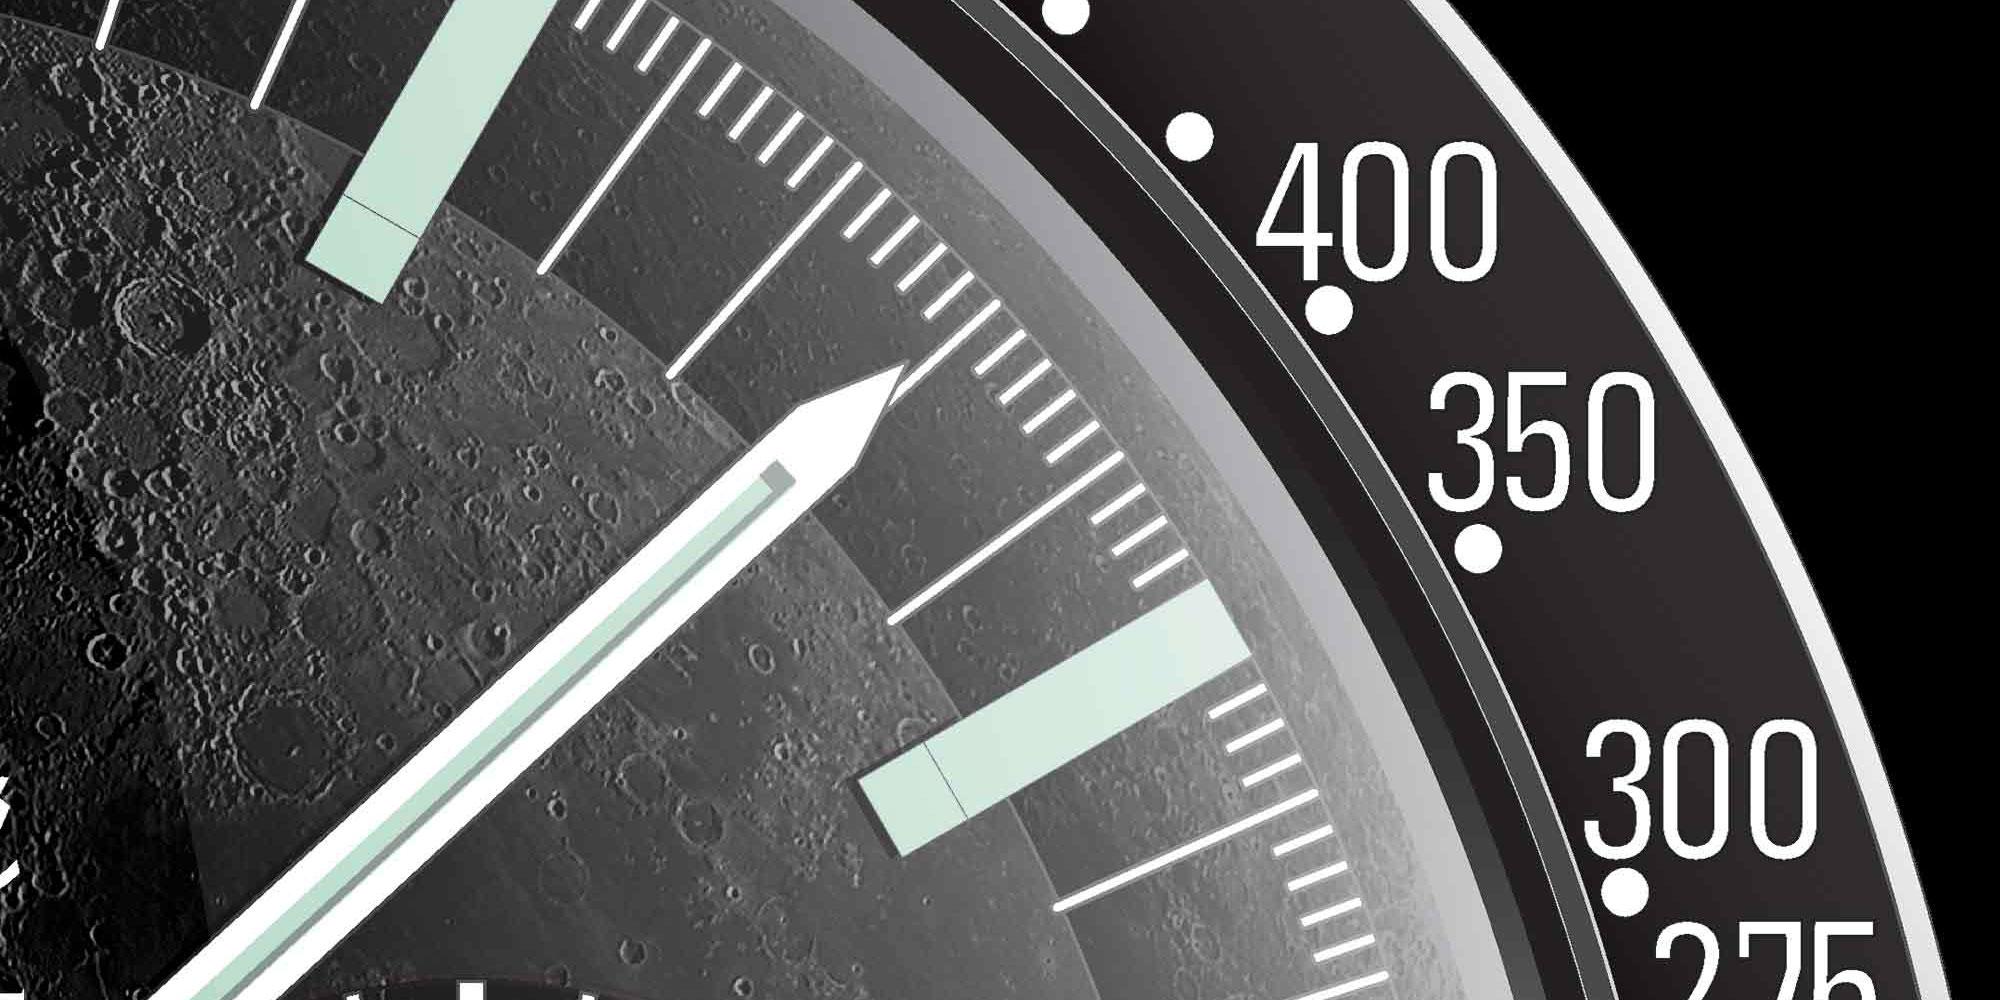 Speedmaster Moonwatch print detail